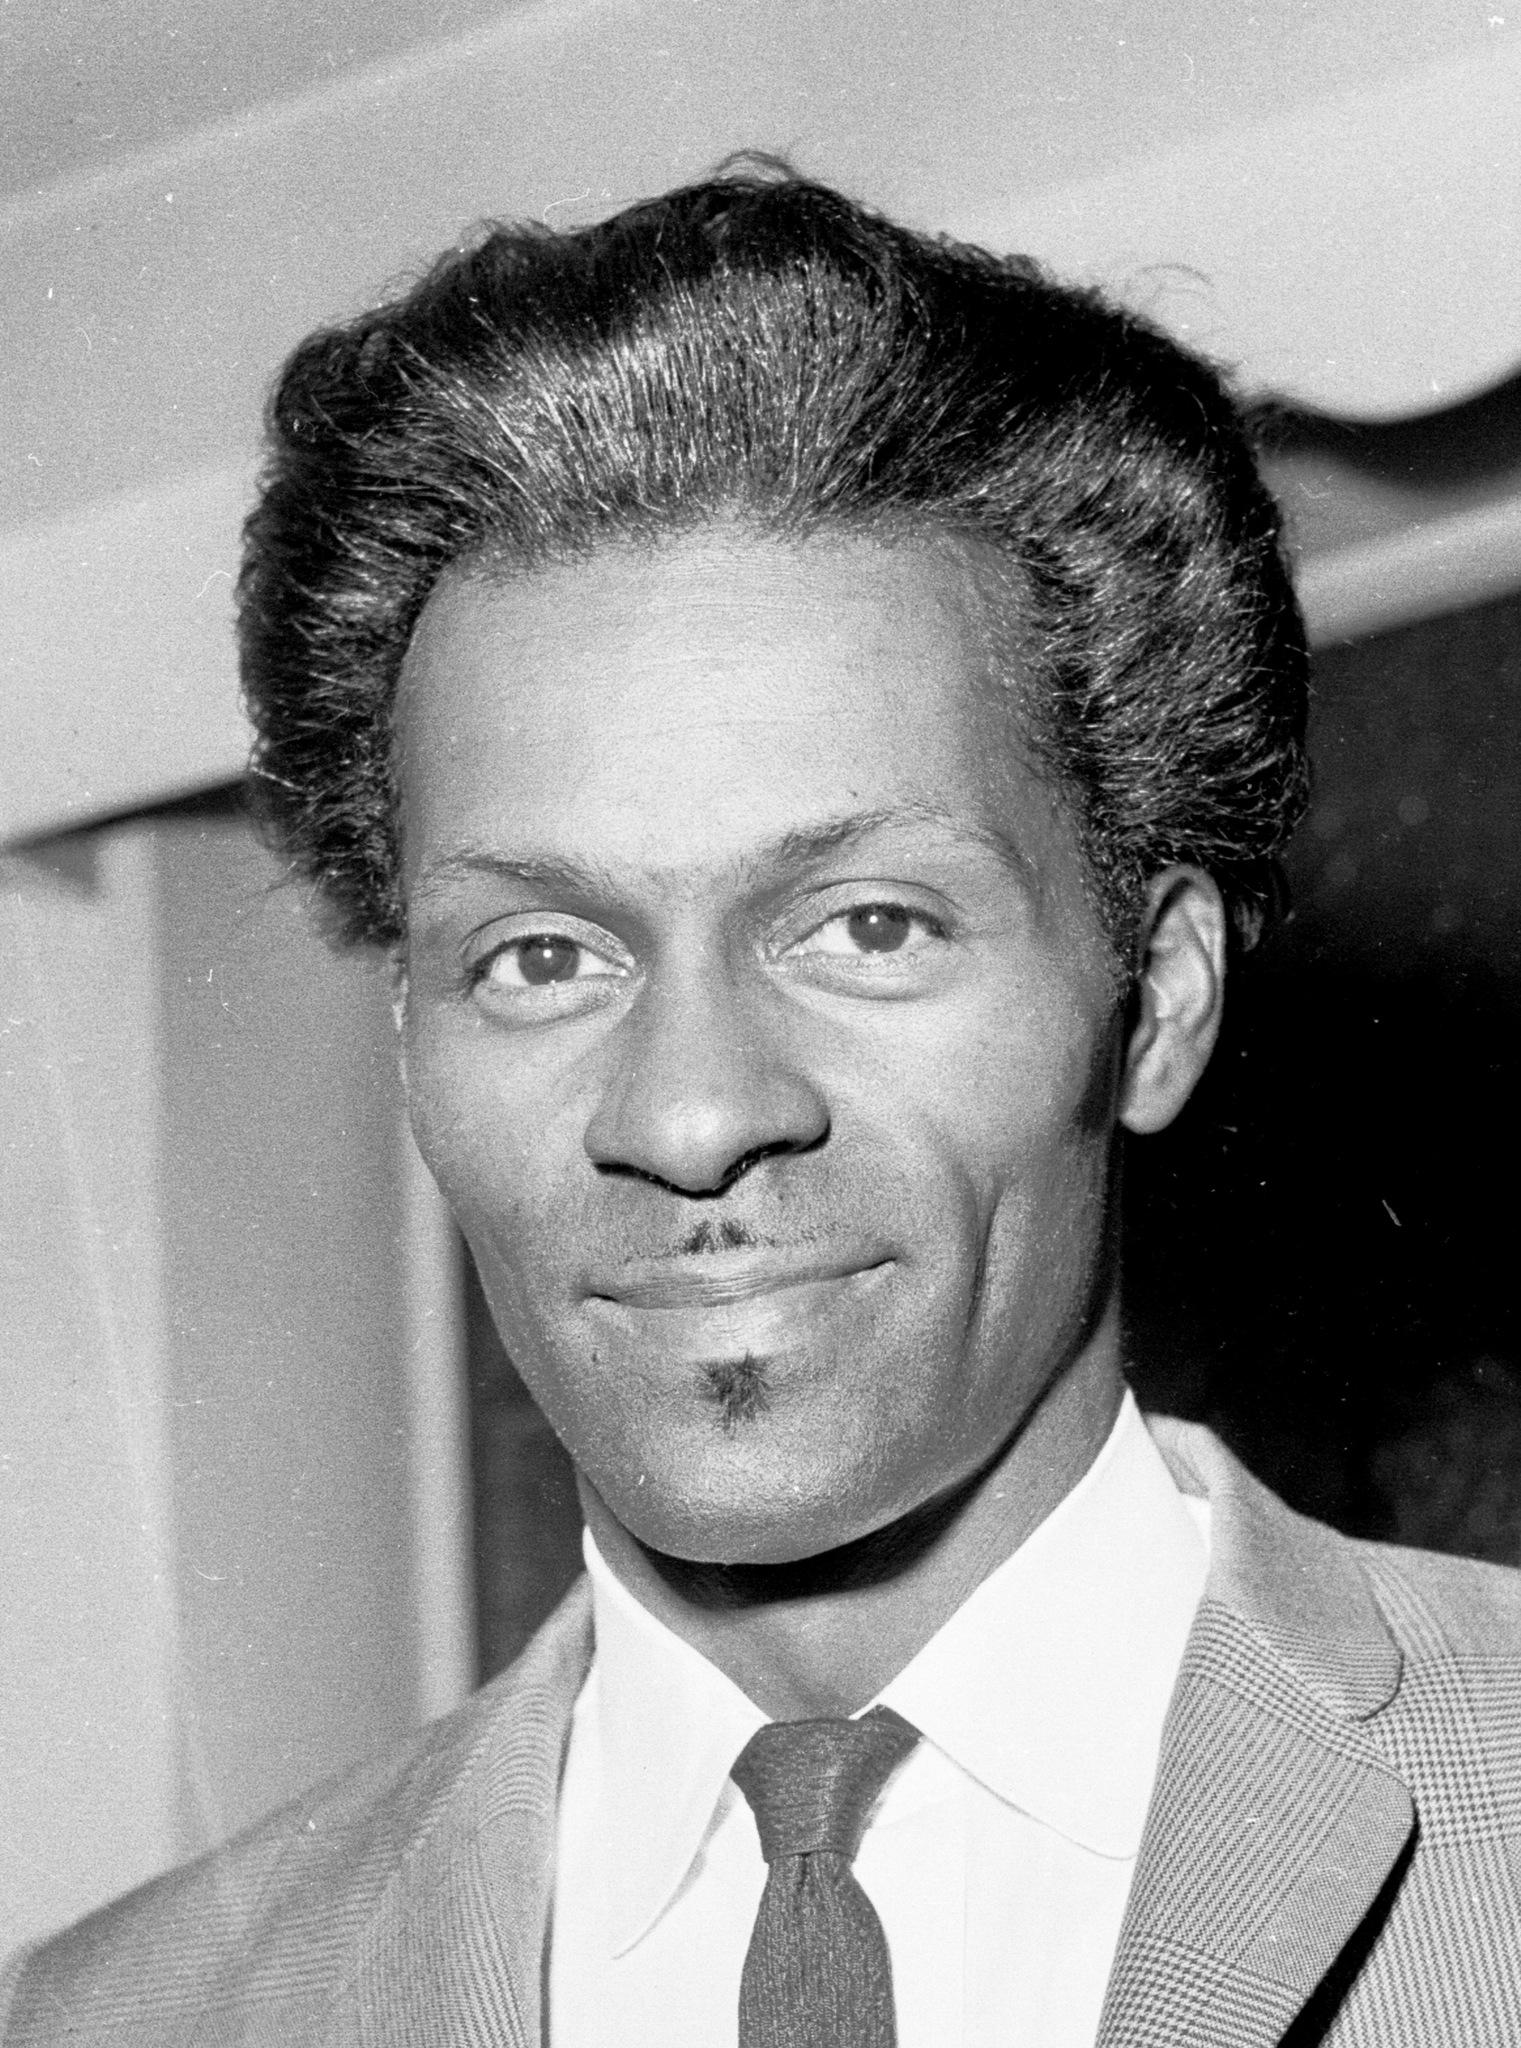 Chuck Berry Imdb